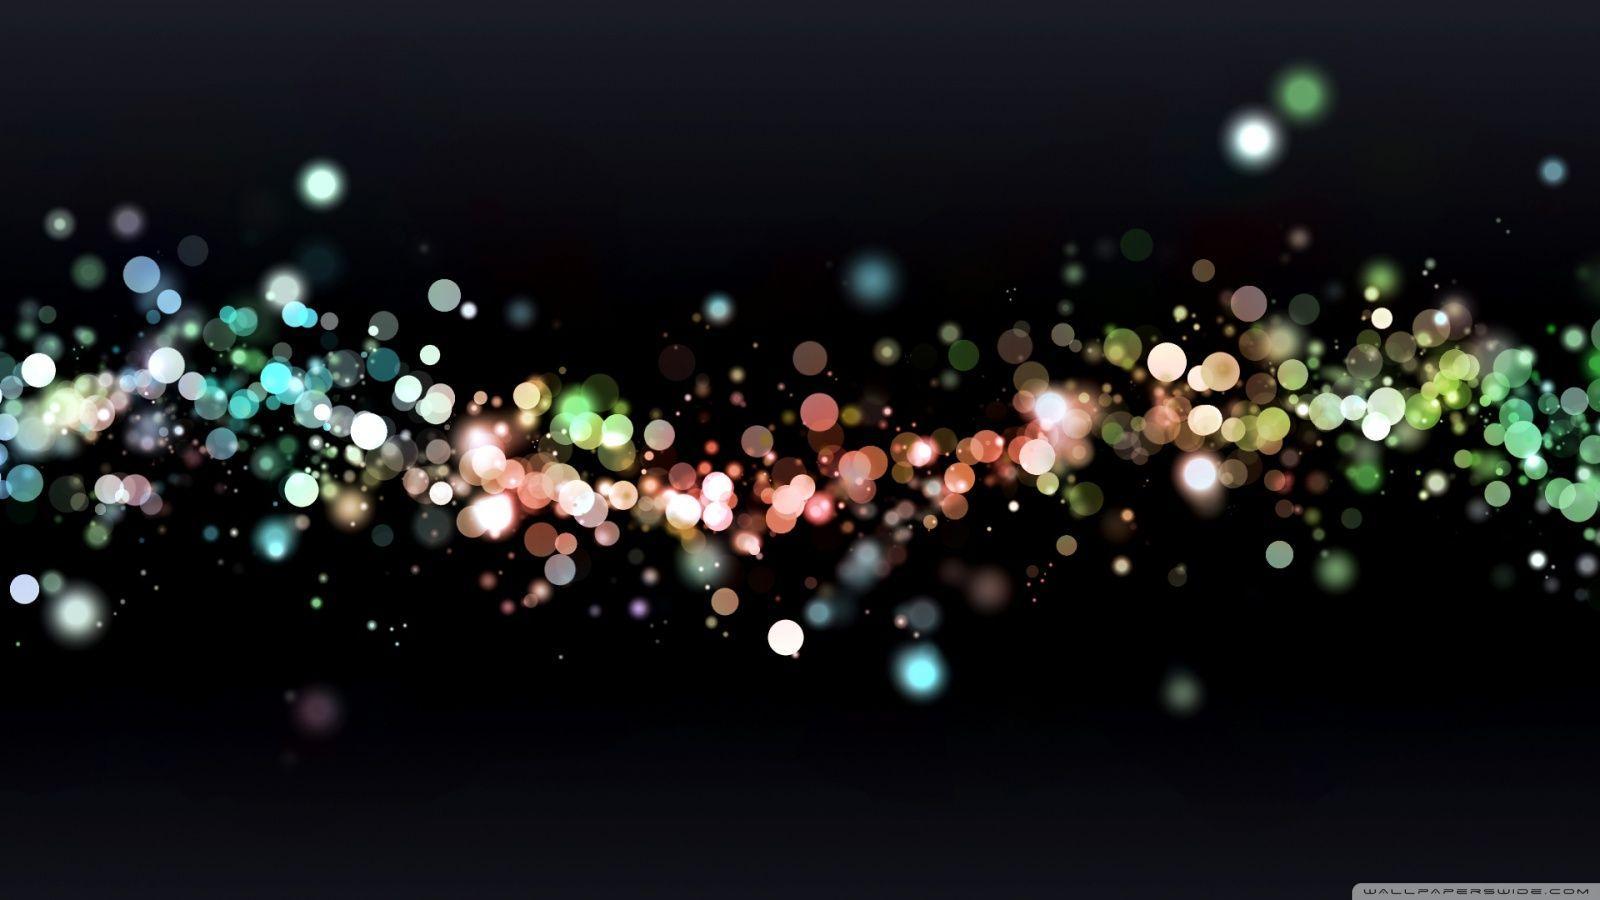 Colored Particles HD desktop wallpaper : Widescreen : High ...